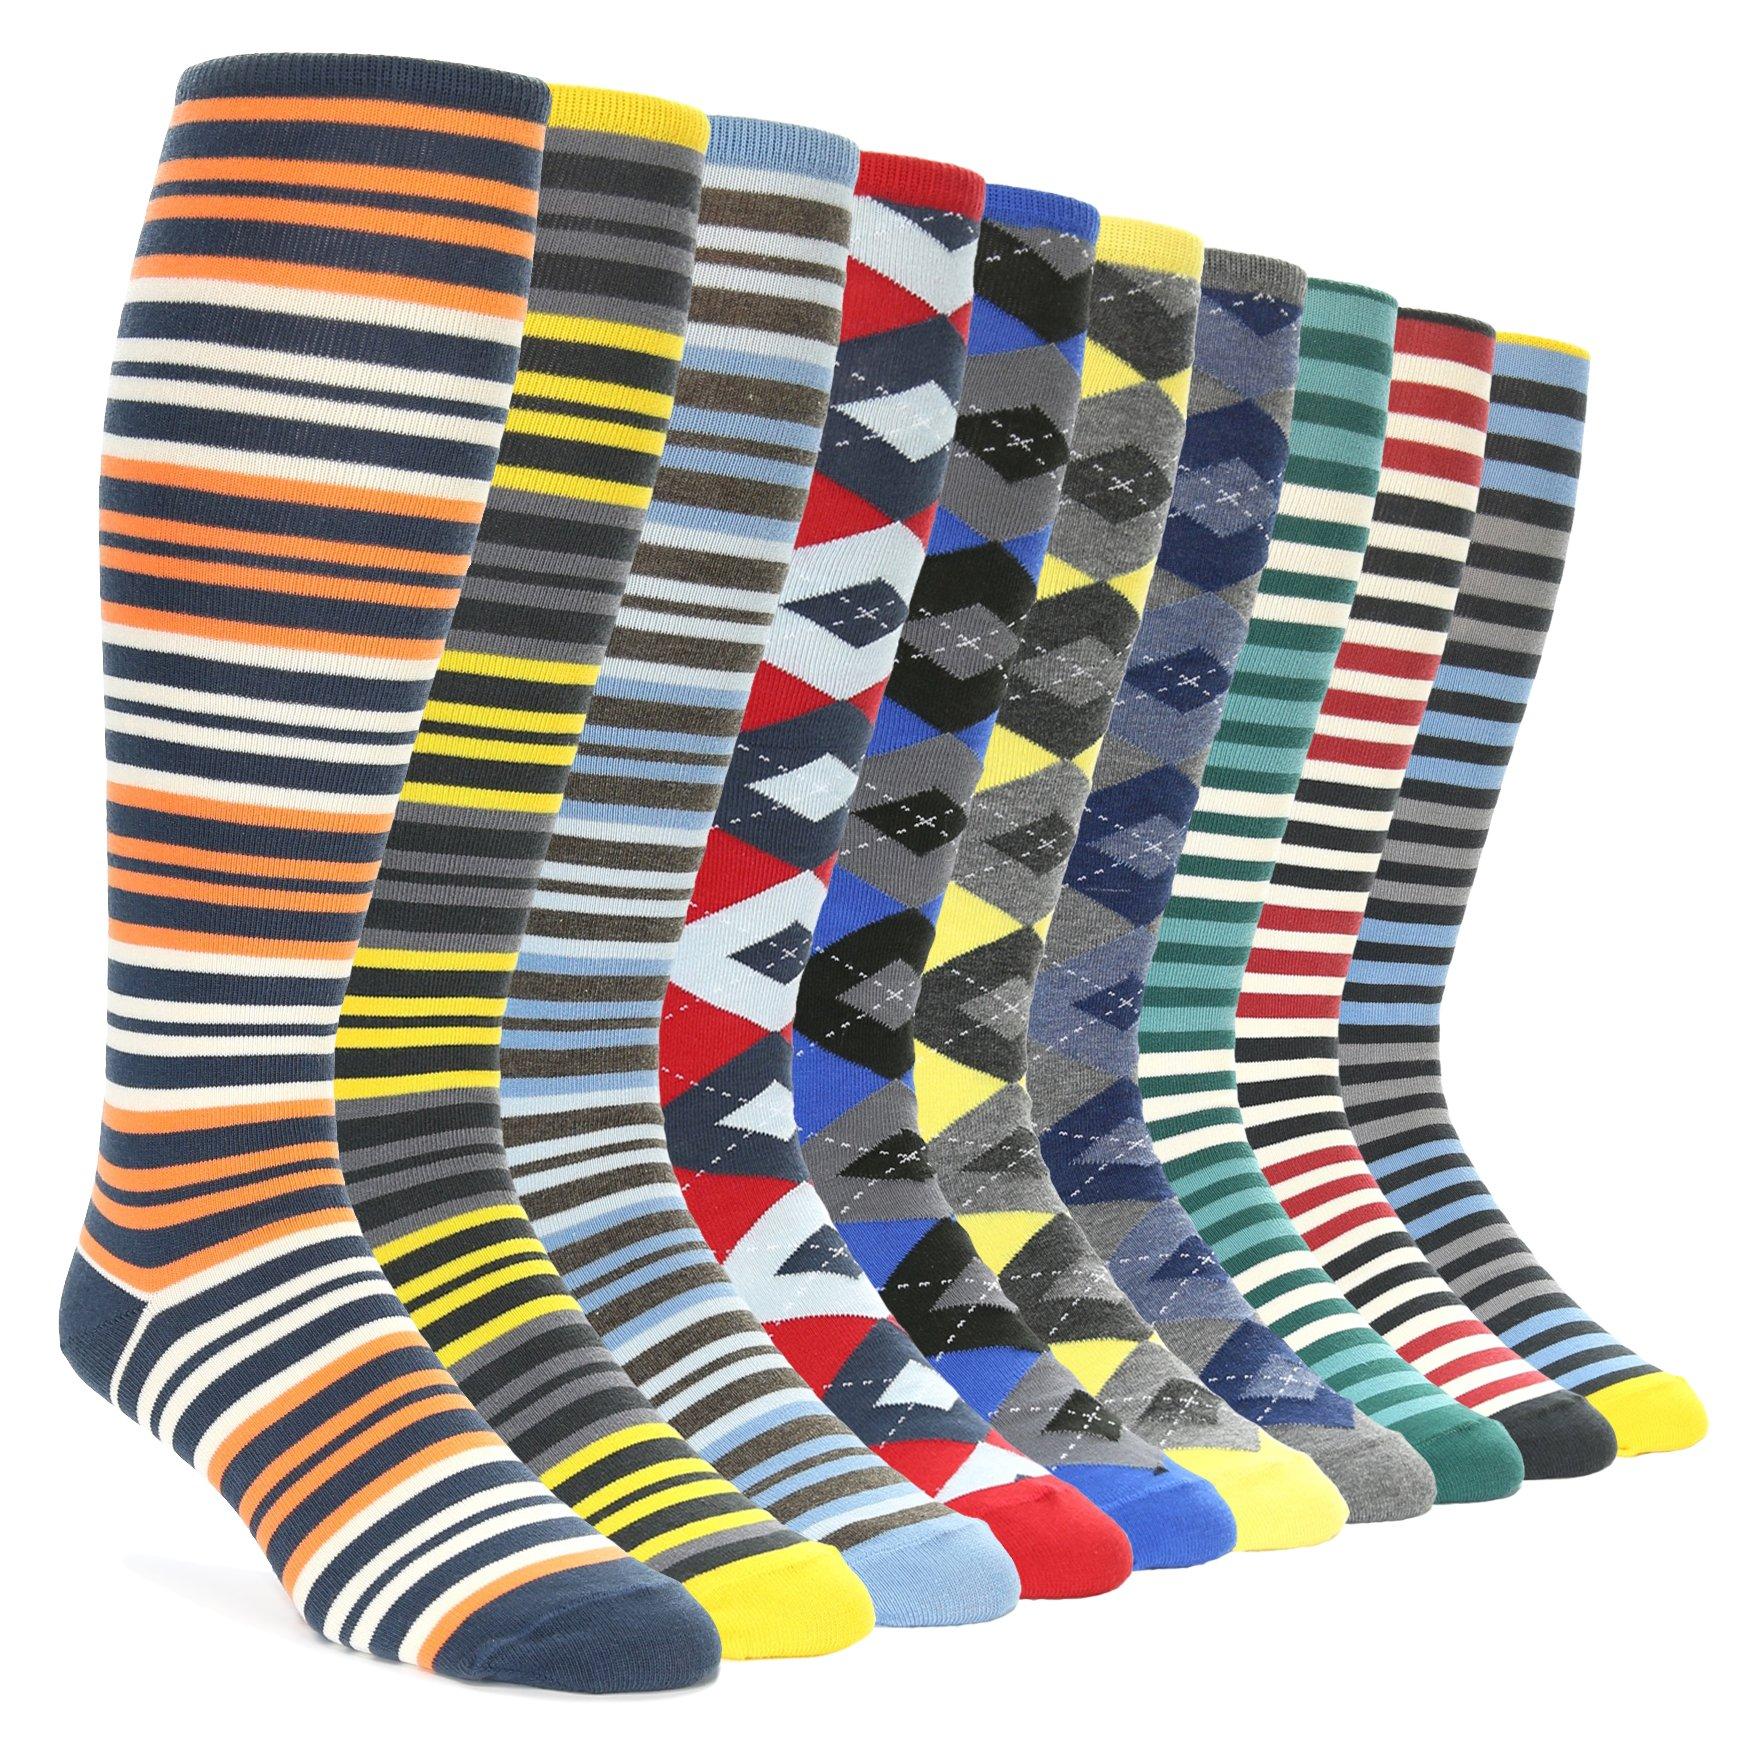 Statement Sockwear Men's Over-the-calf Dress Socks (10 Pair Collection)